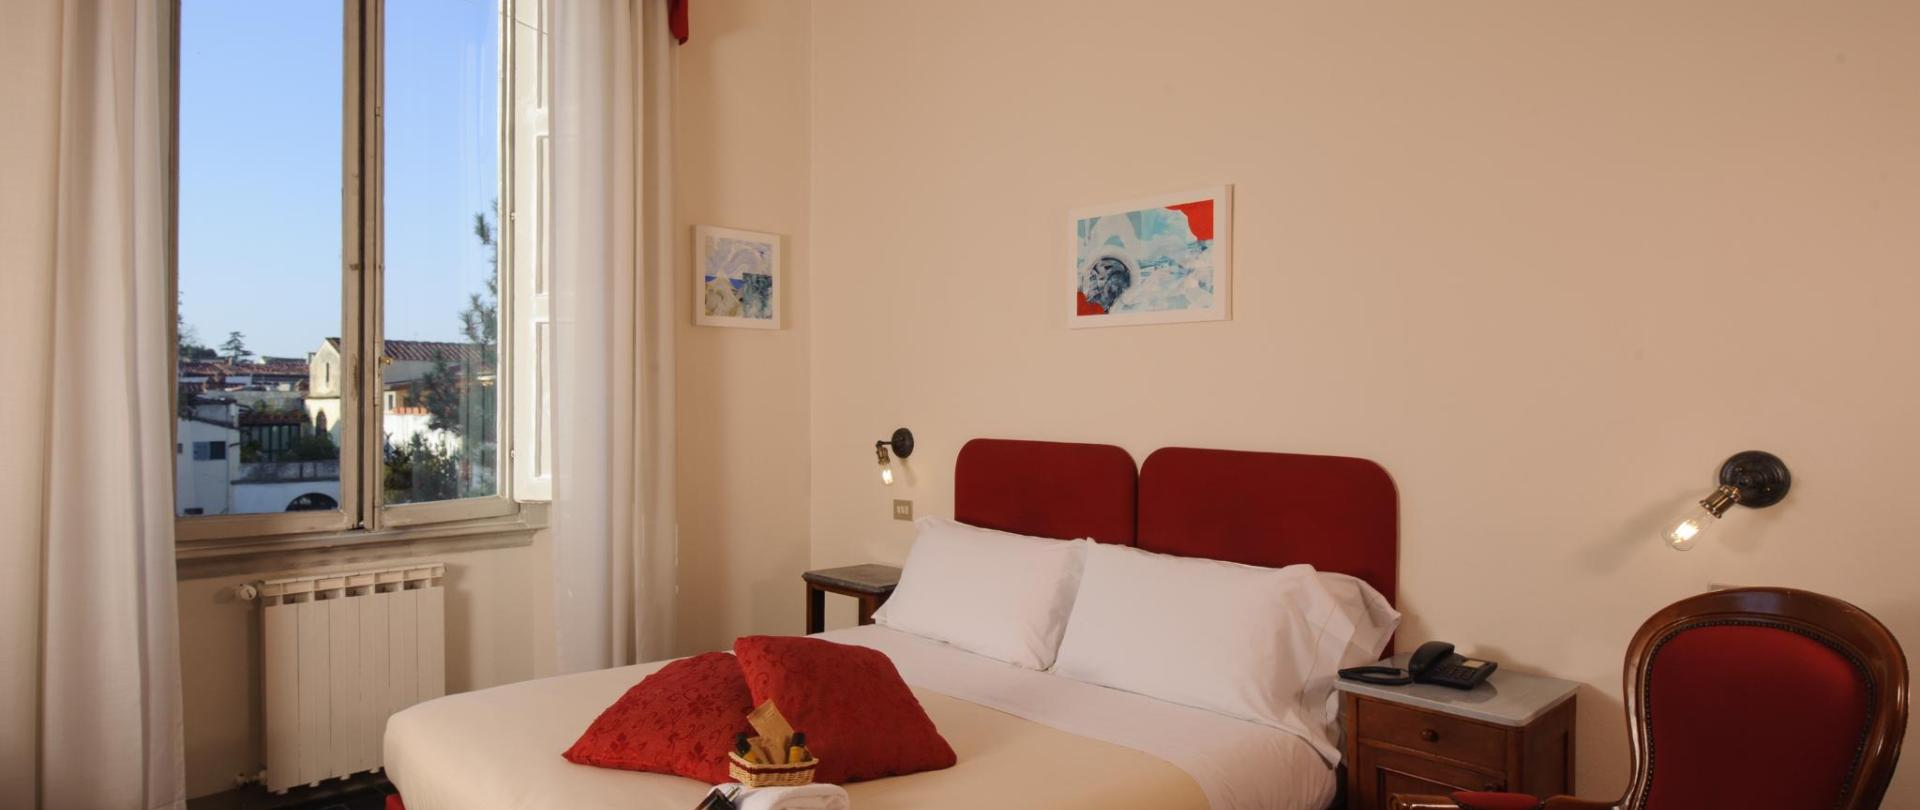 hotelannalena-26.jpg